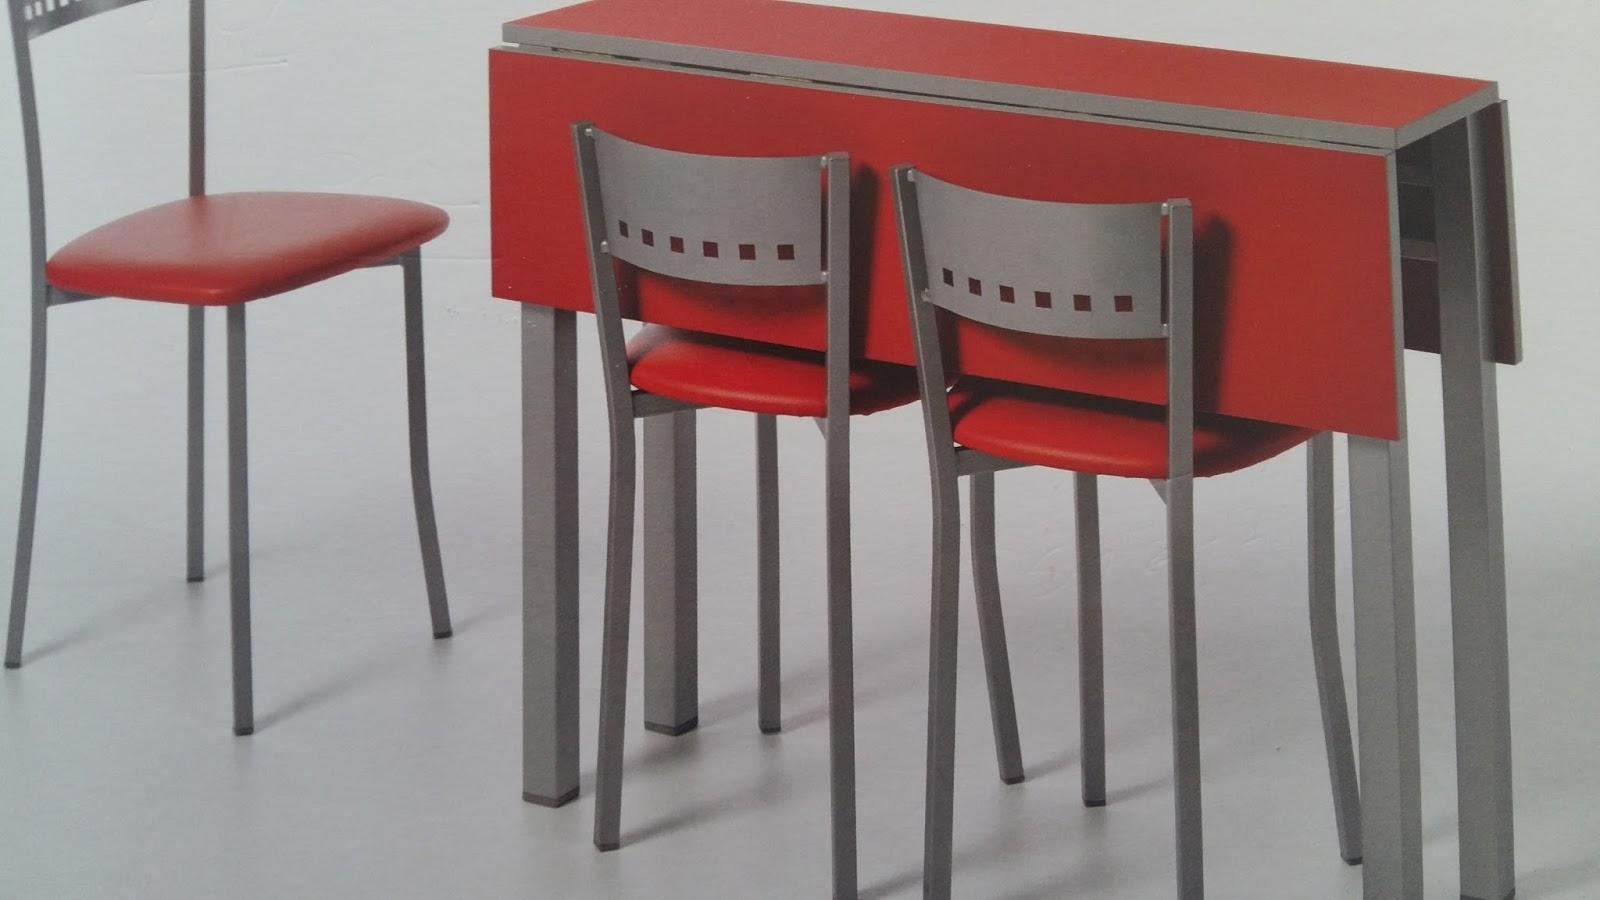 Plathoo dise o de cocinas y ba os 3d mesas sillas y for Sillas con brazos para cocina